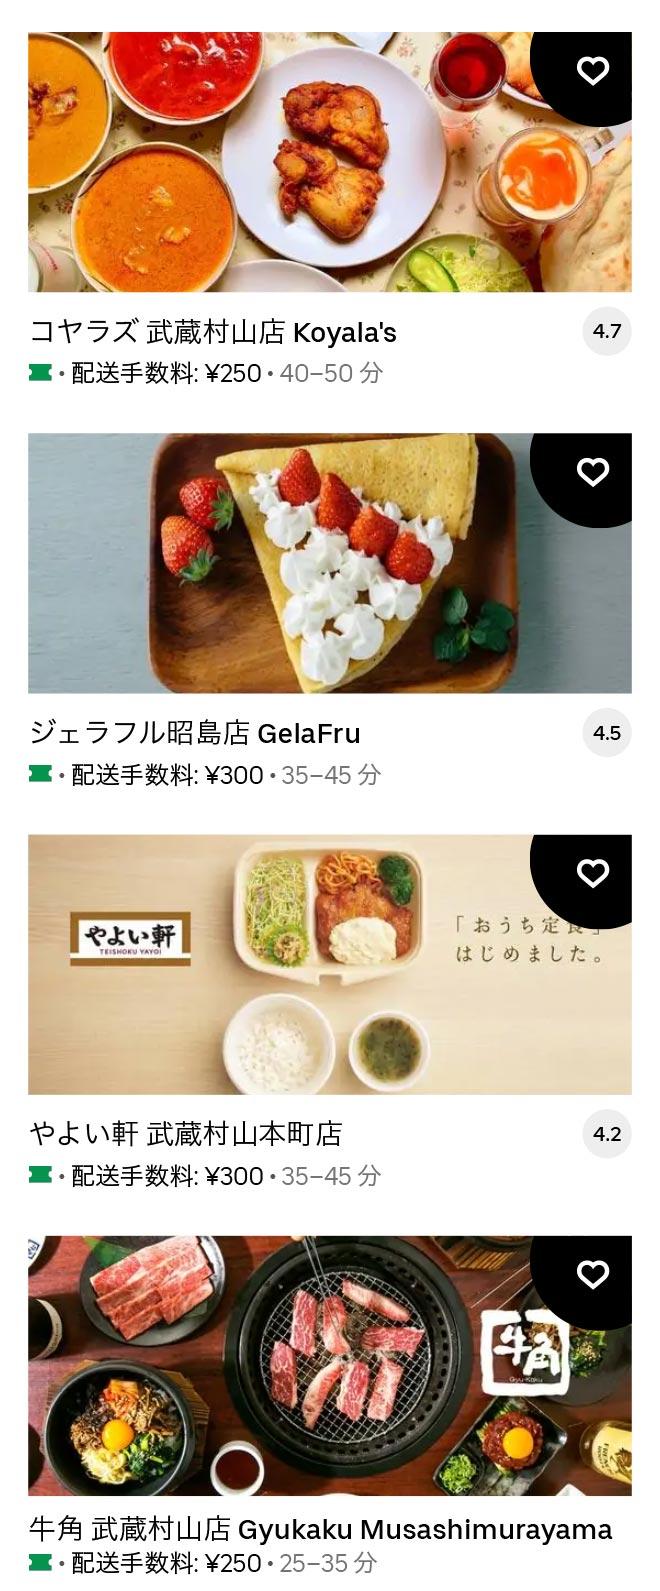 U musashi murayama 2106 11